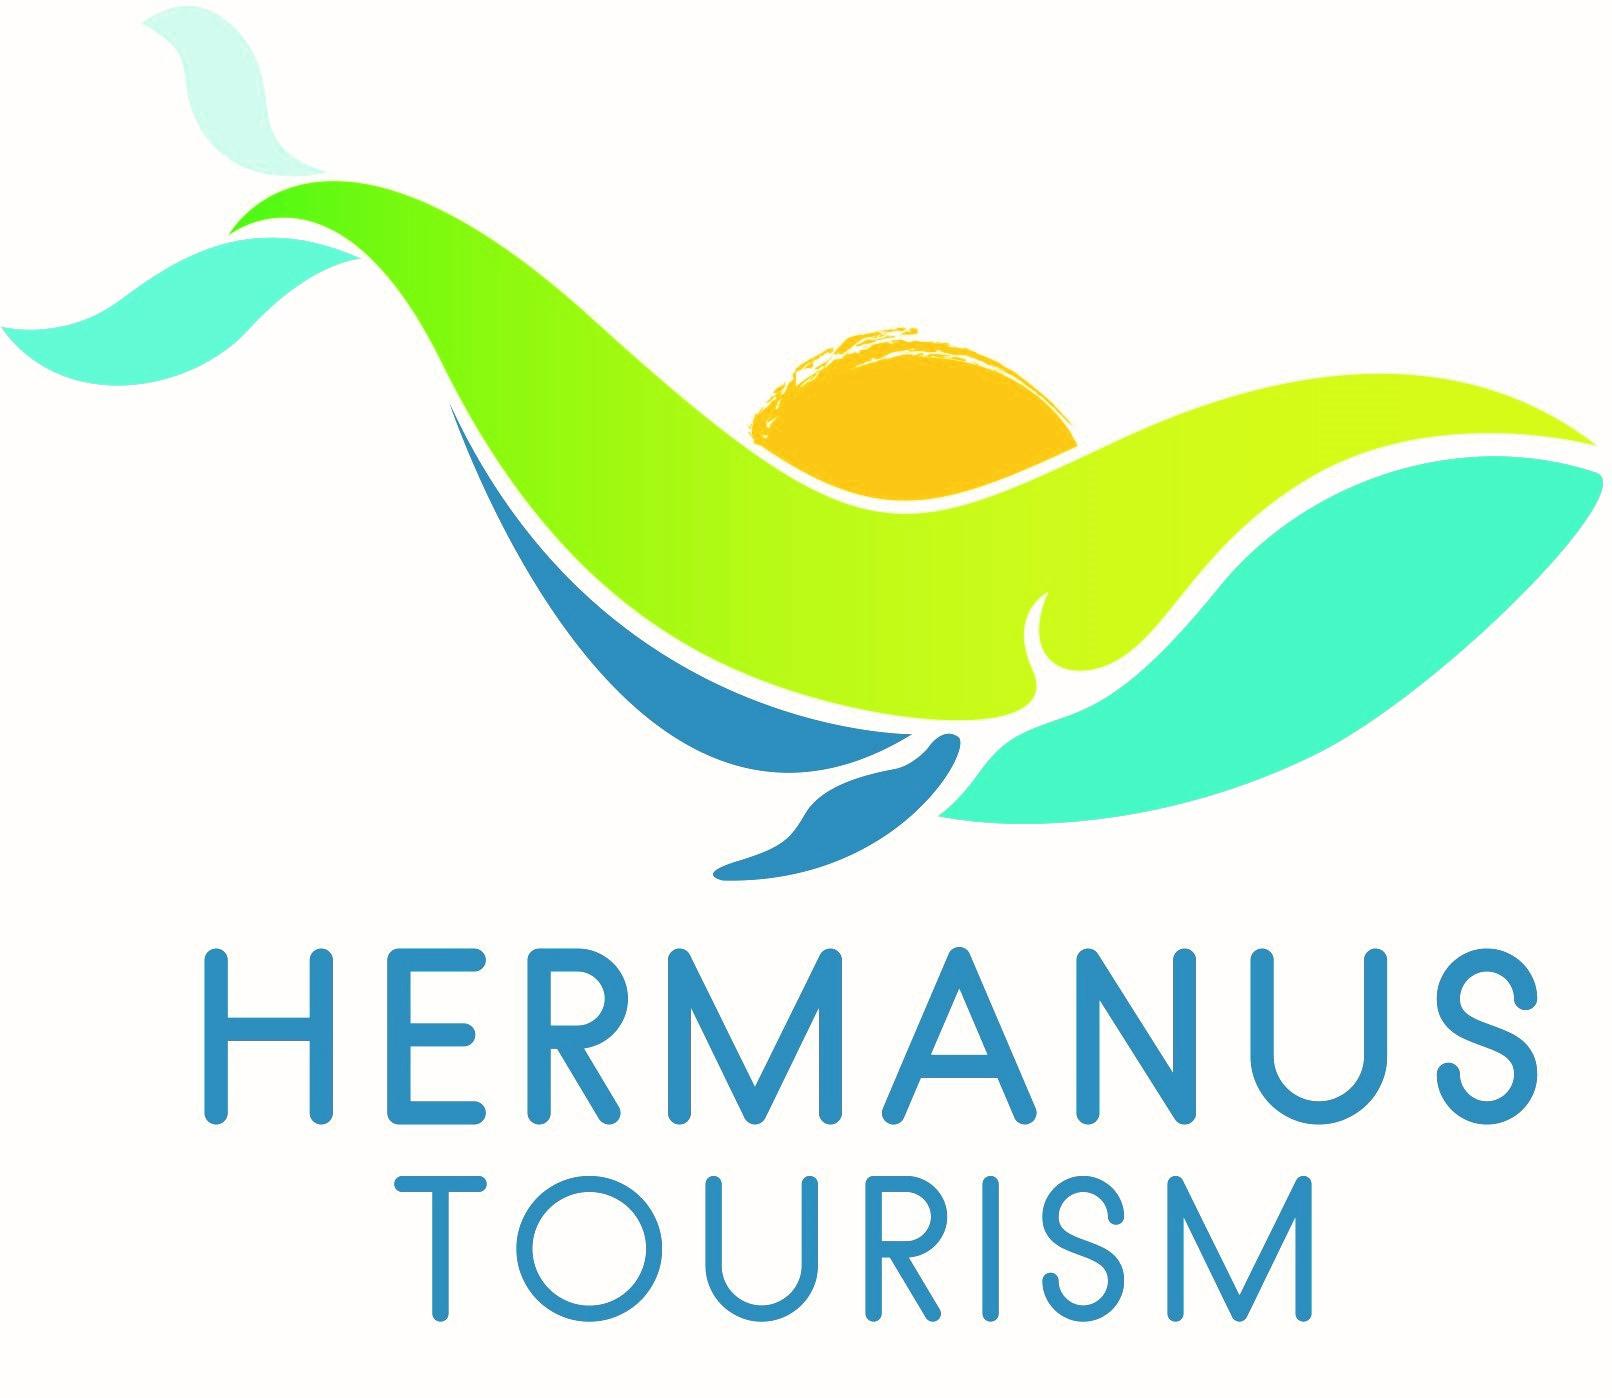 https://kleinmondtourism.co.za/wp-content/uploads/2020/09/LOGO-high-res-cmyk-3.jpg